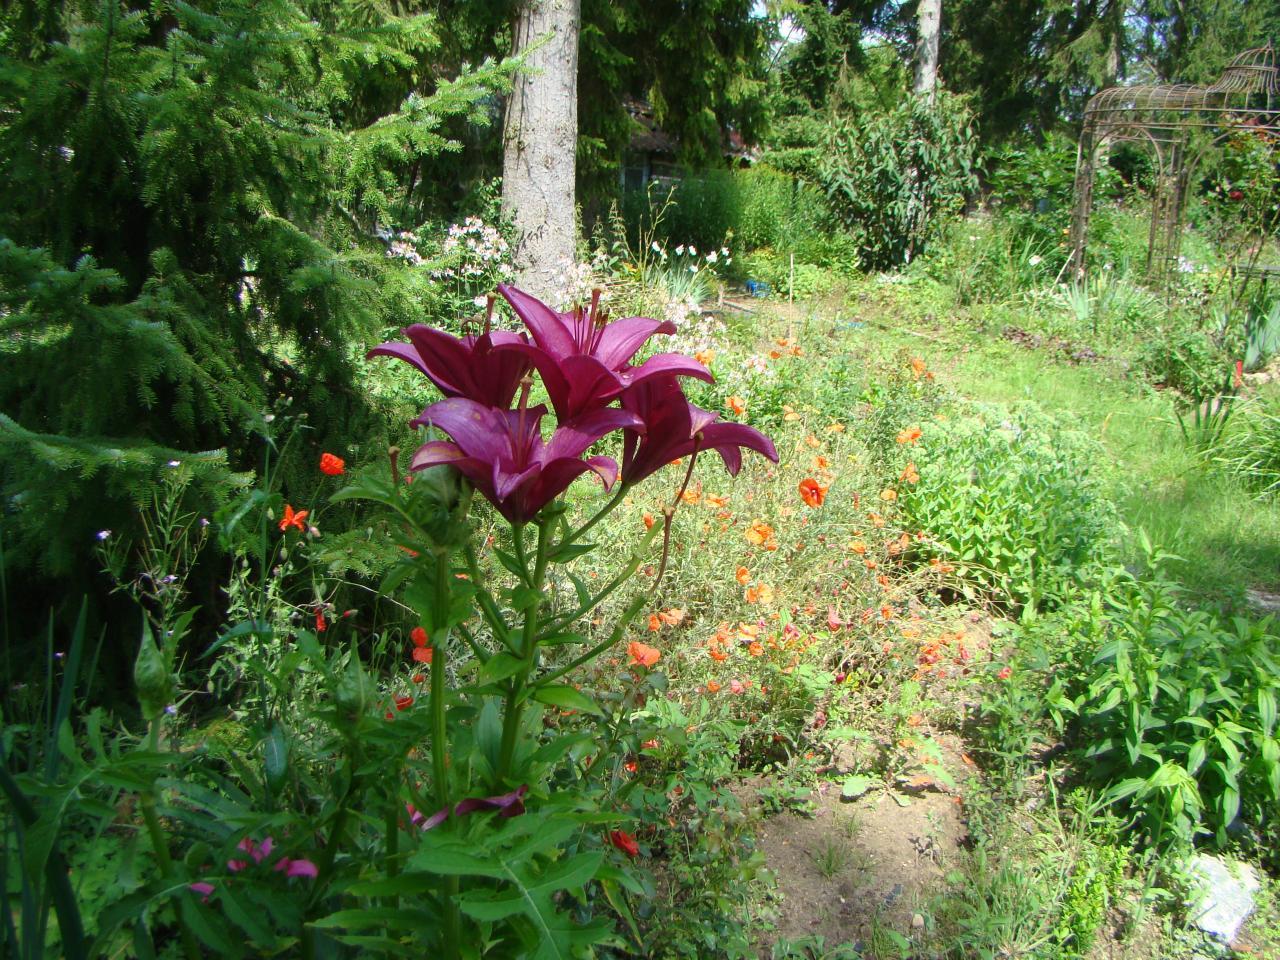 Chambres d 39 h tes en for t de compi gne for Guide des fleurs du jardin